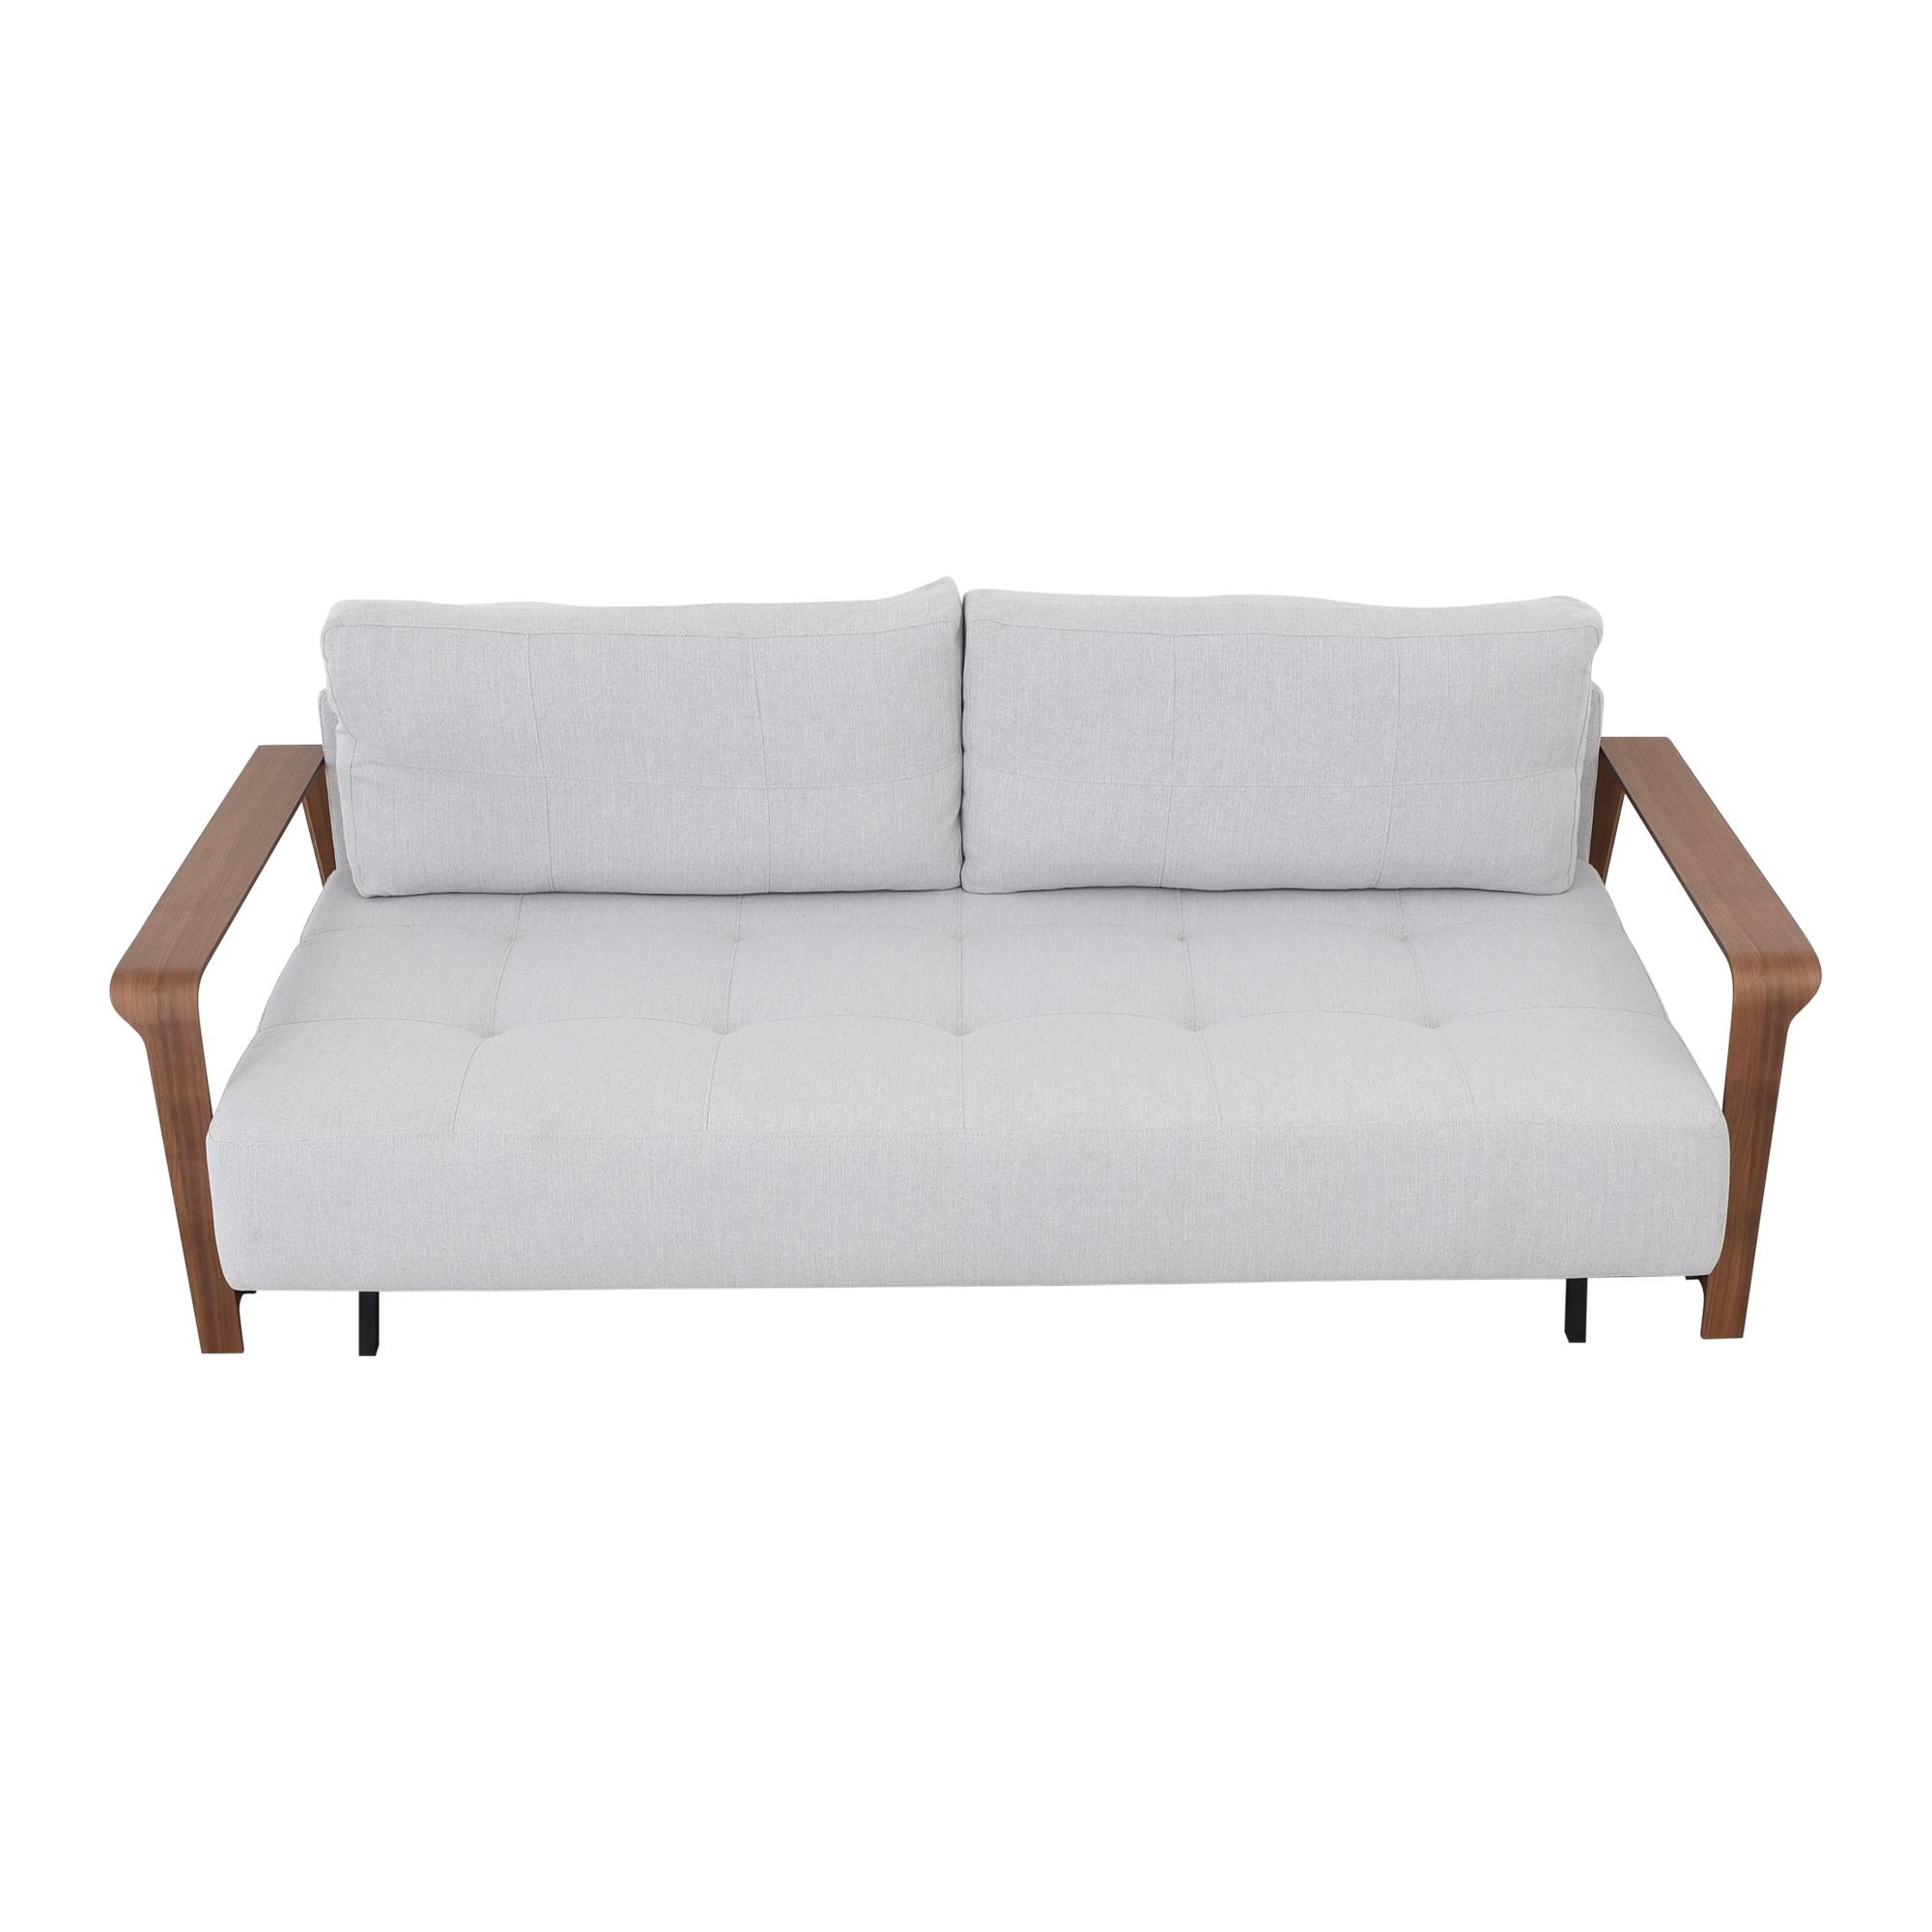 shop Innovation Living Innovation Living Ran Deluxe Sofa online